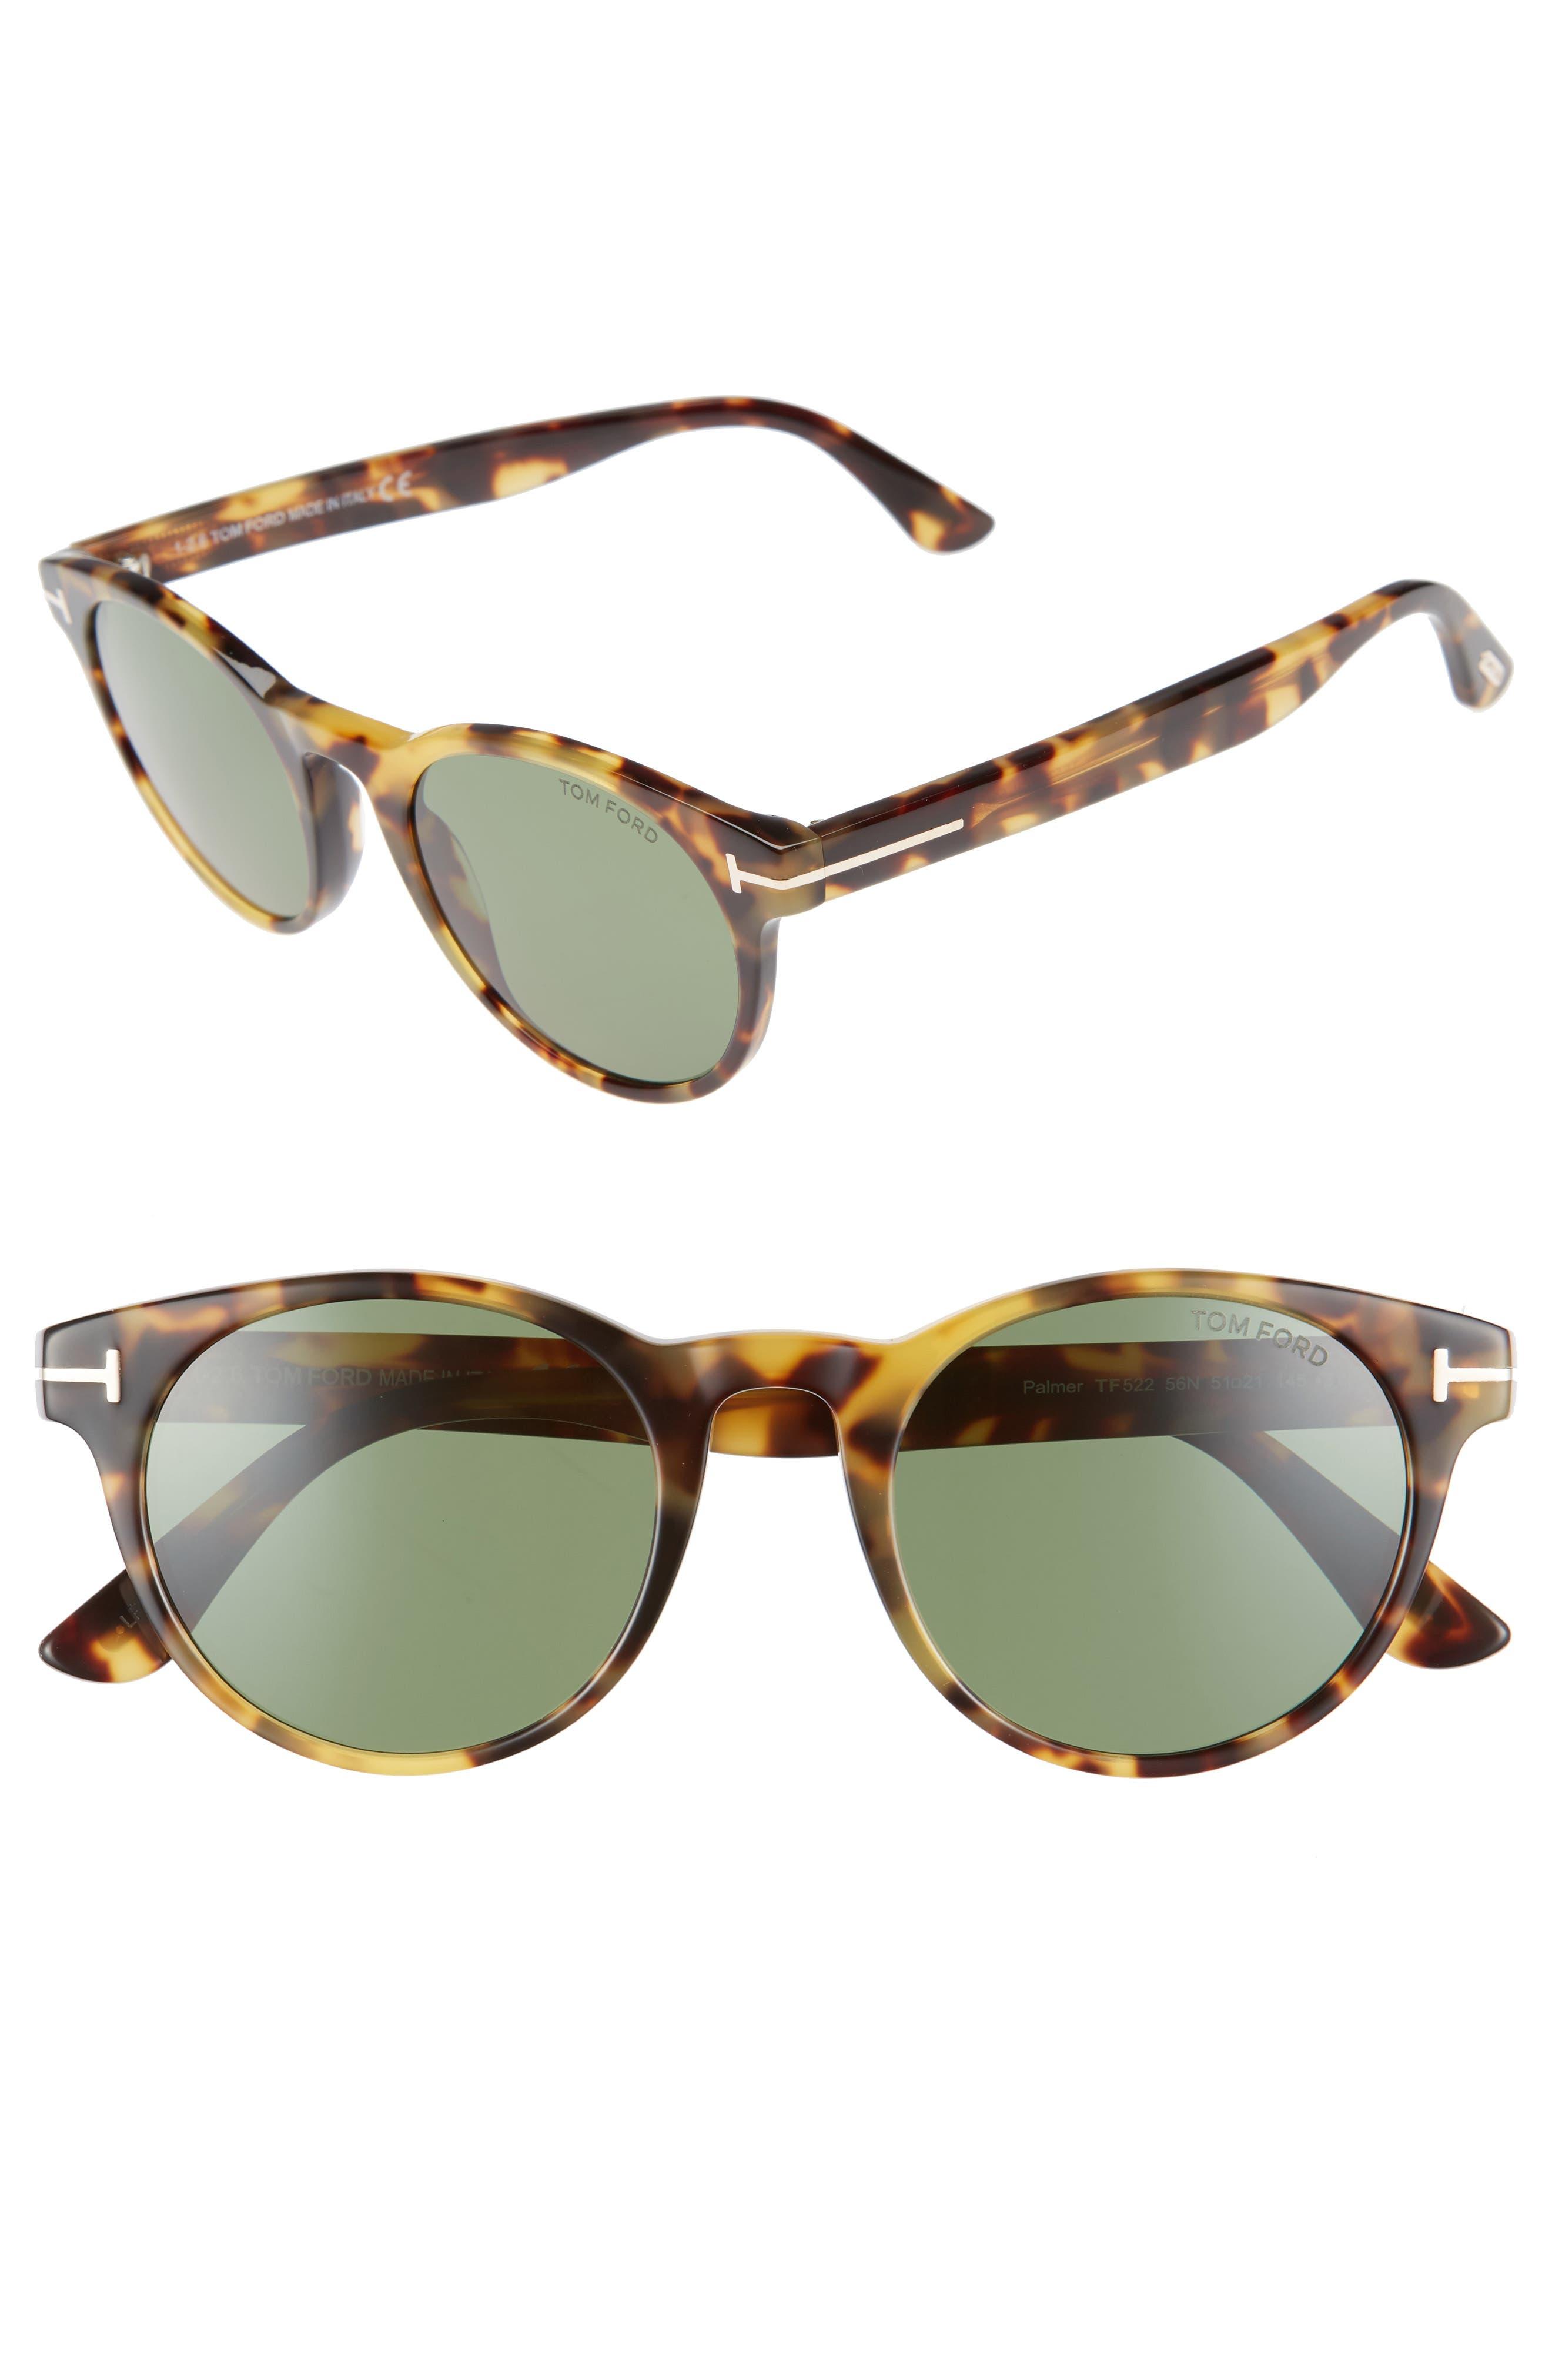 Main Image - Tom Ford Palmer 51mm Gradient Lens Sunglasses